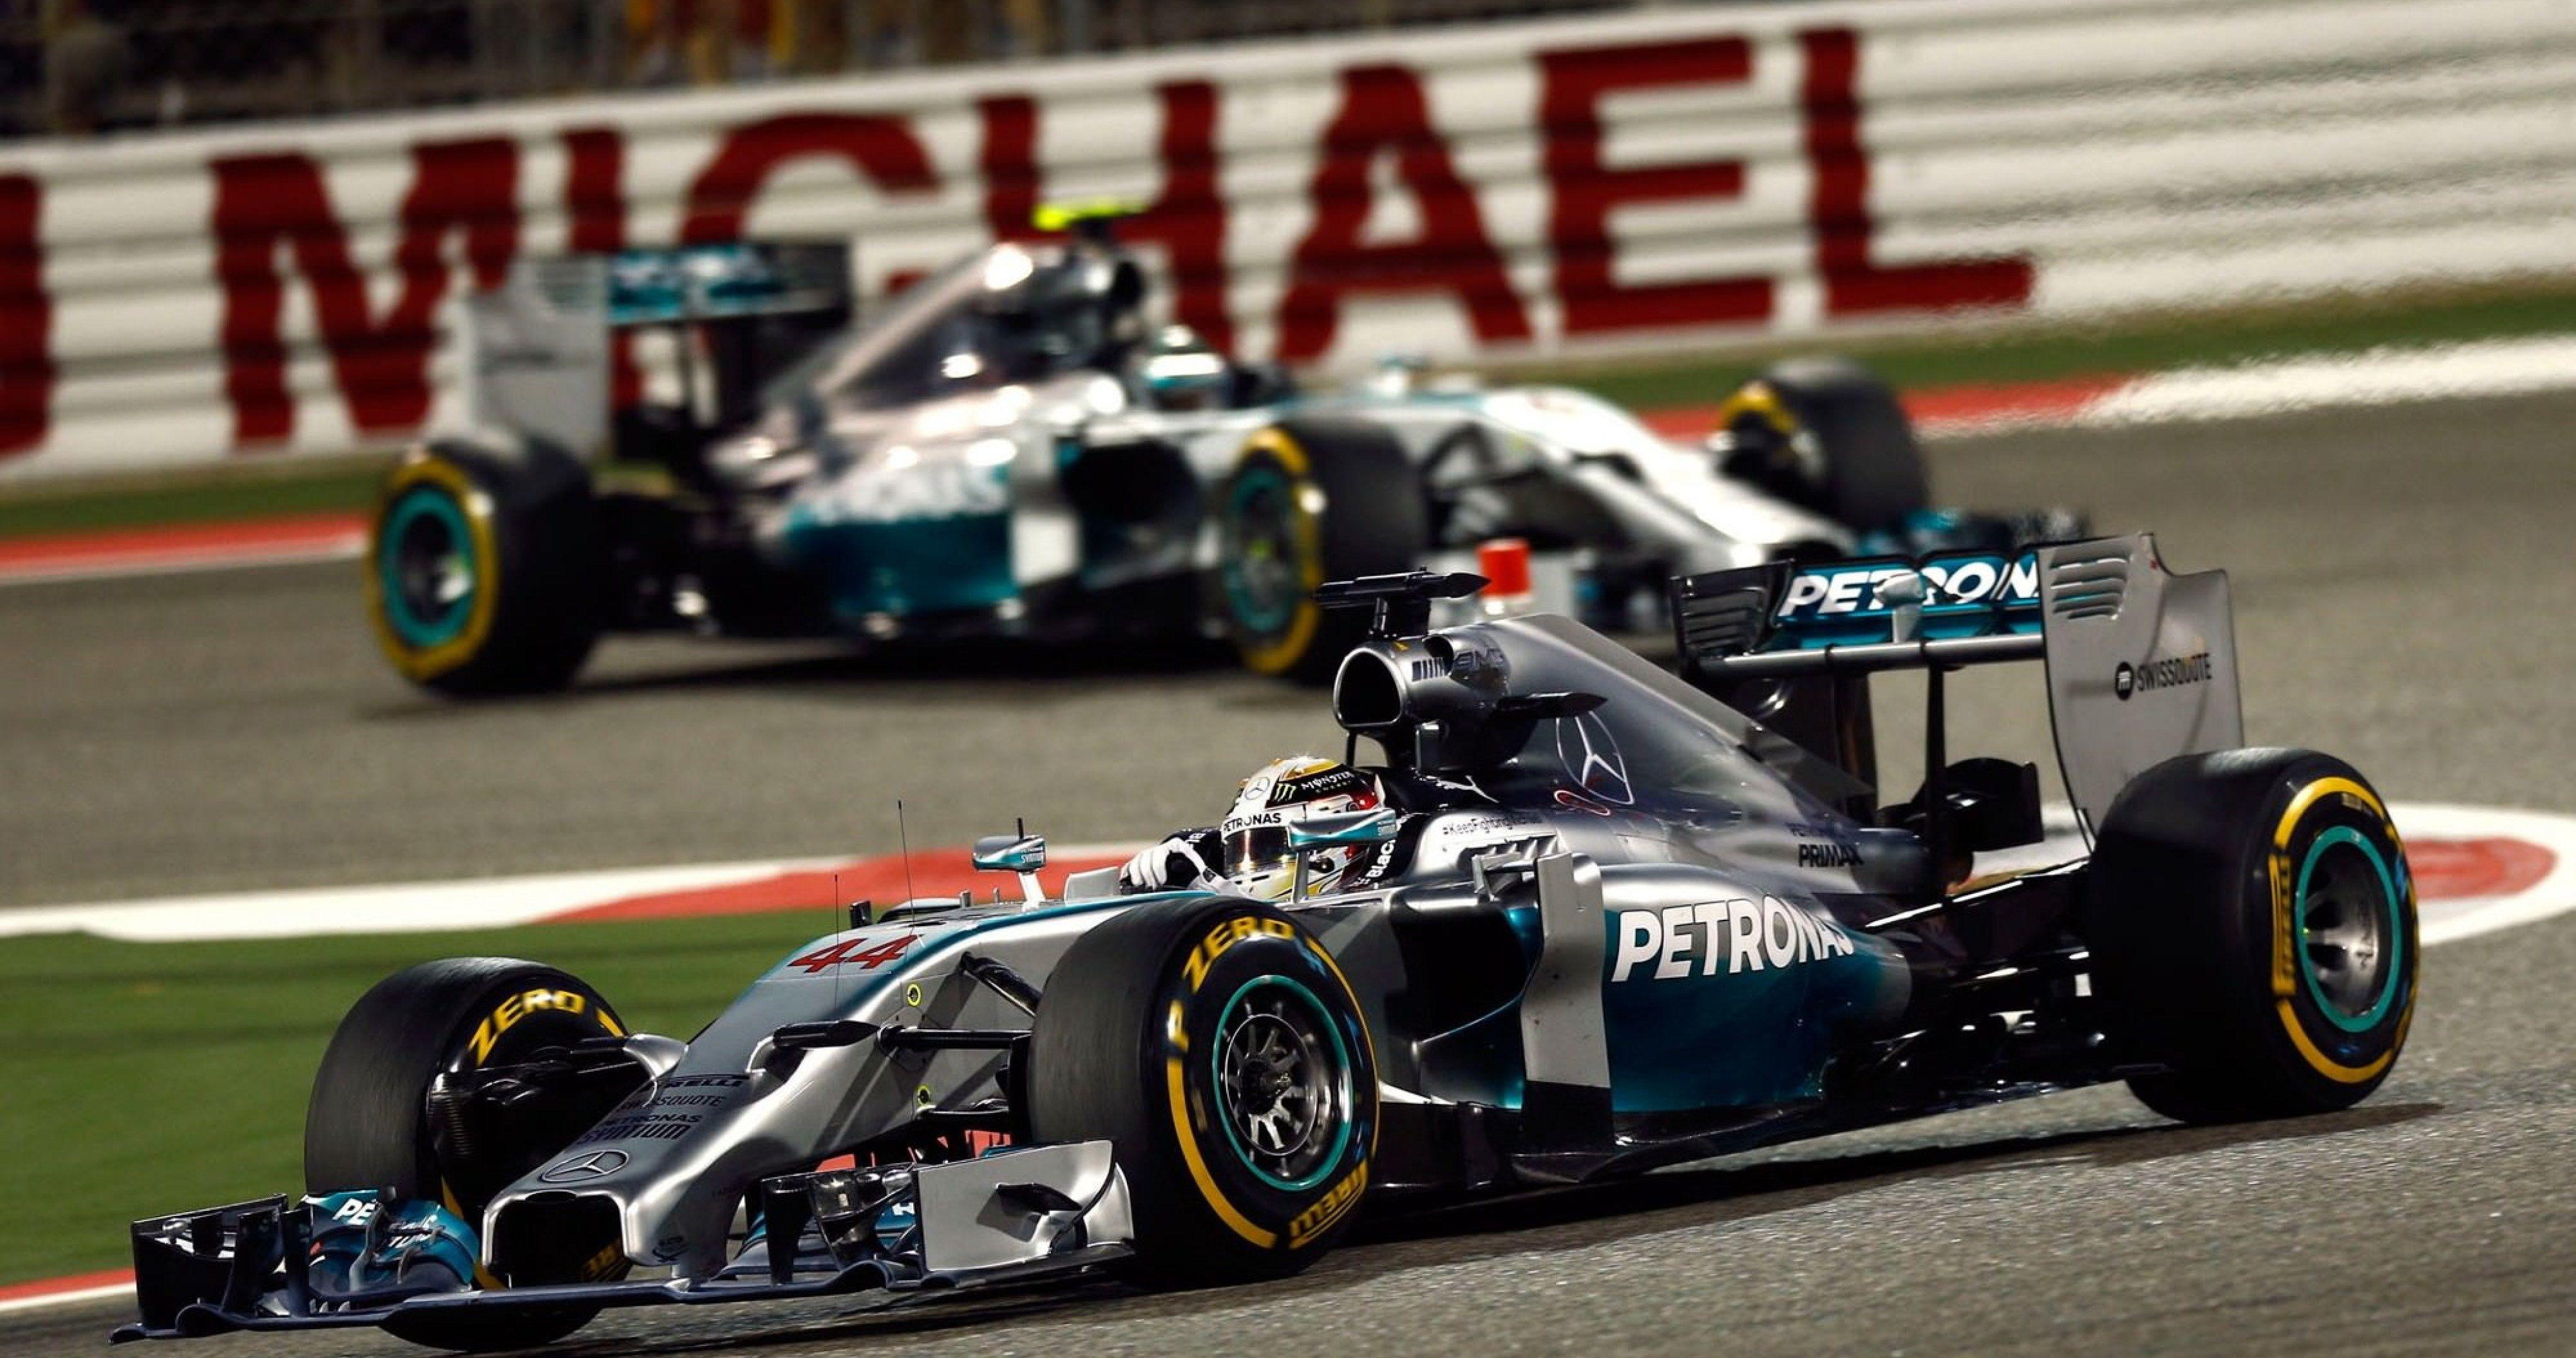 Mercedes Amg Petronas F1 Hd Hintergrundbilder 4k